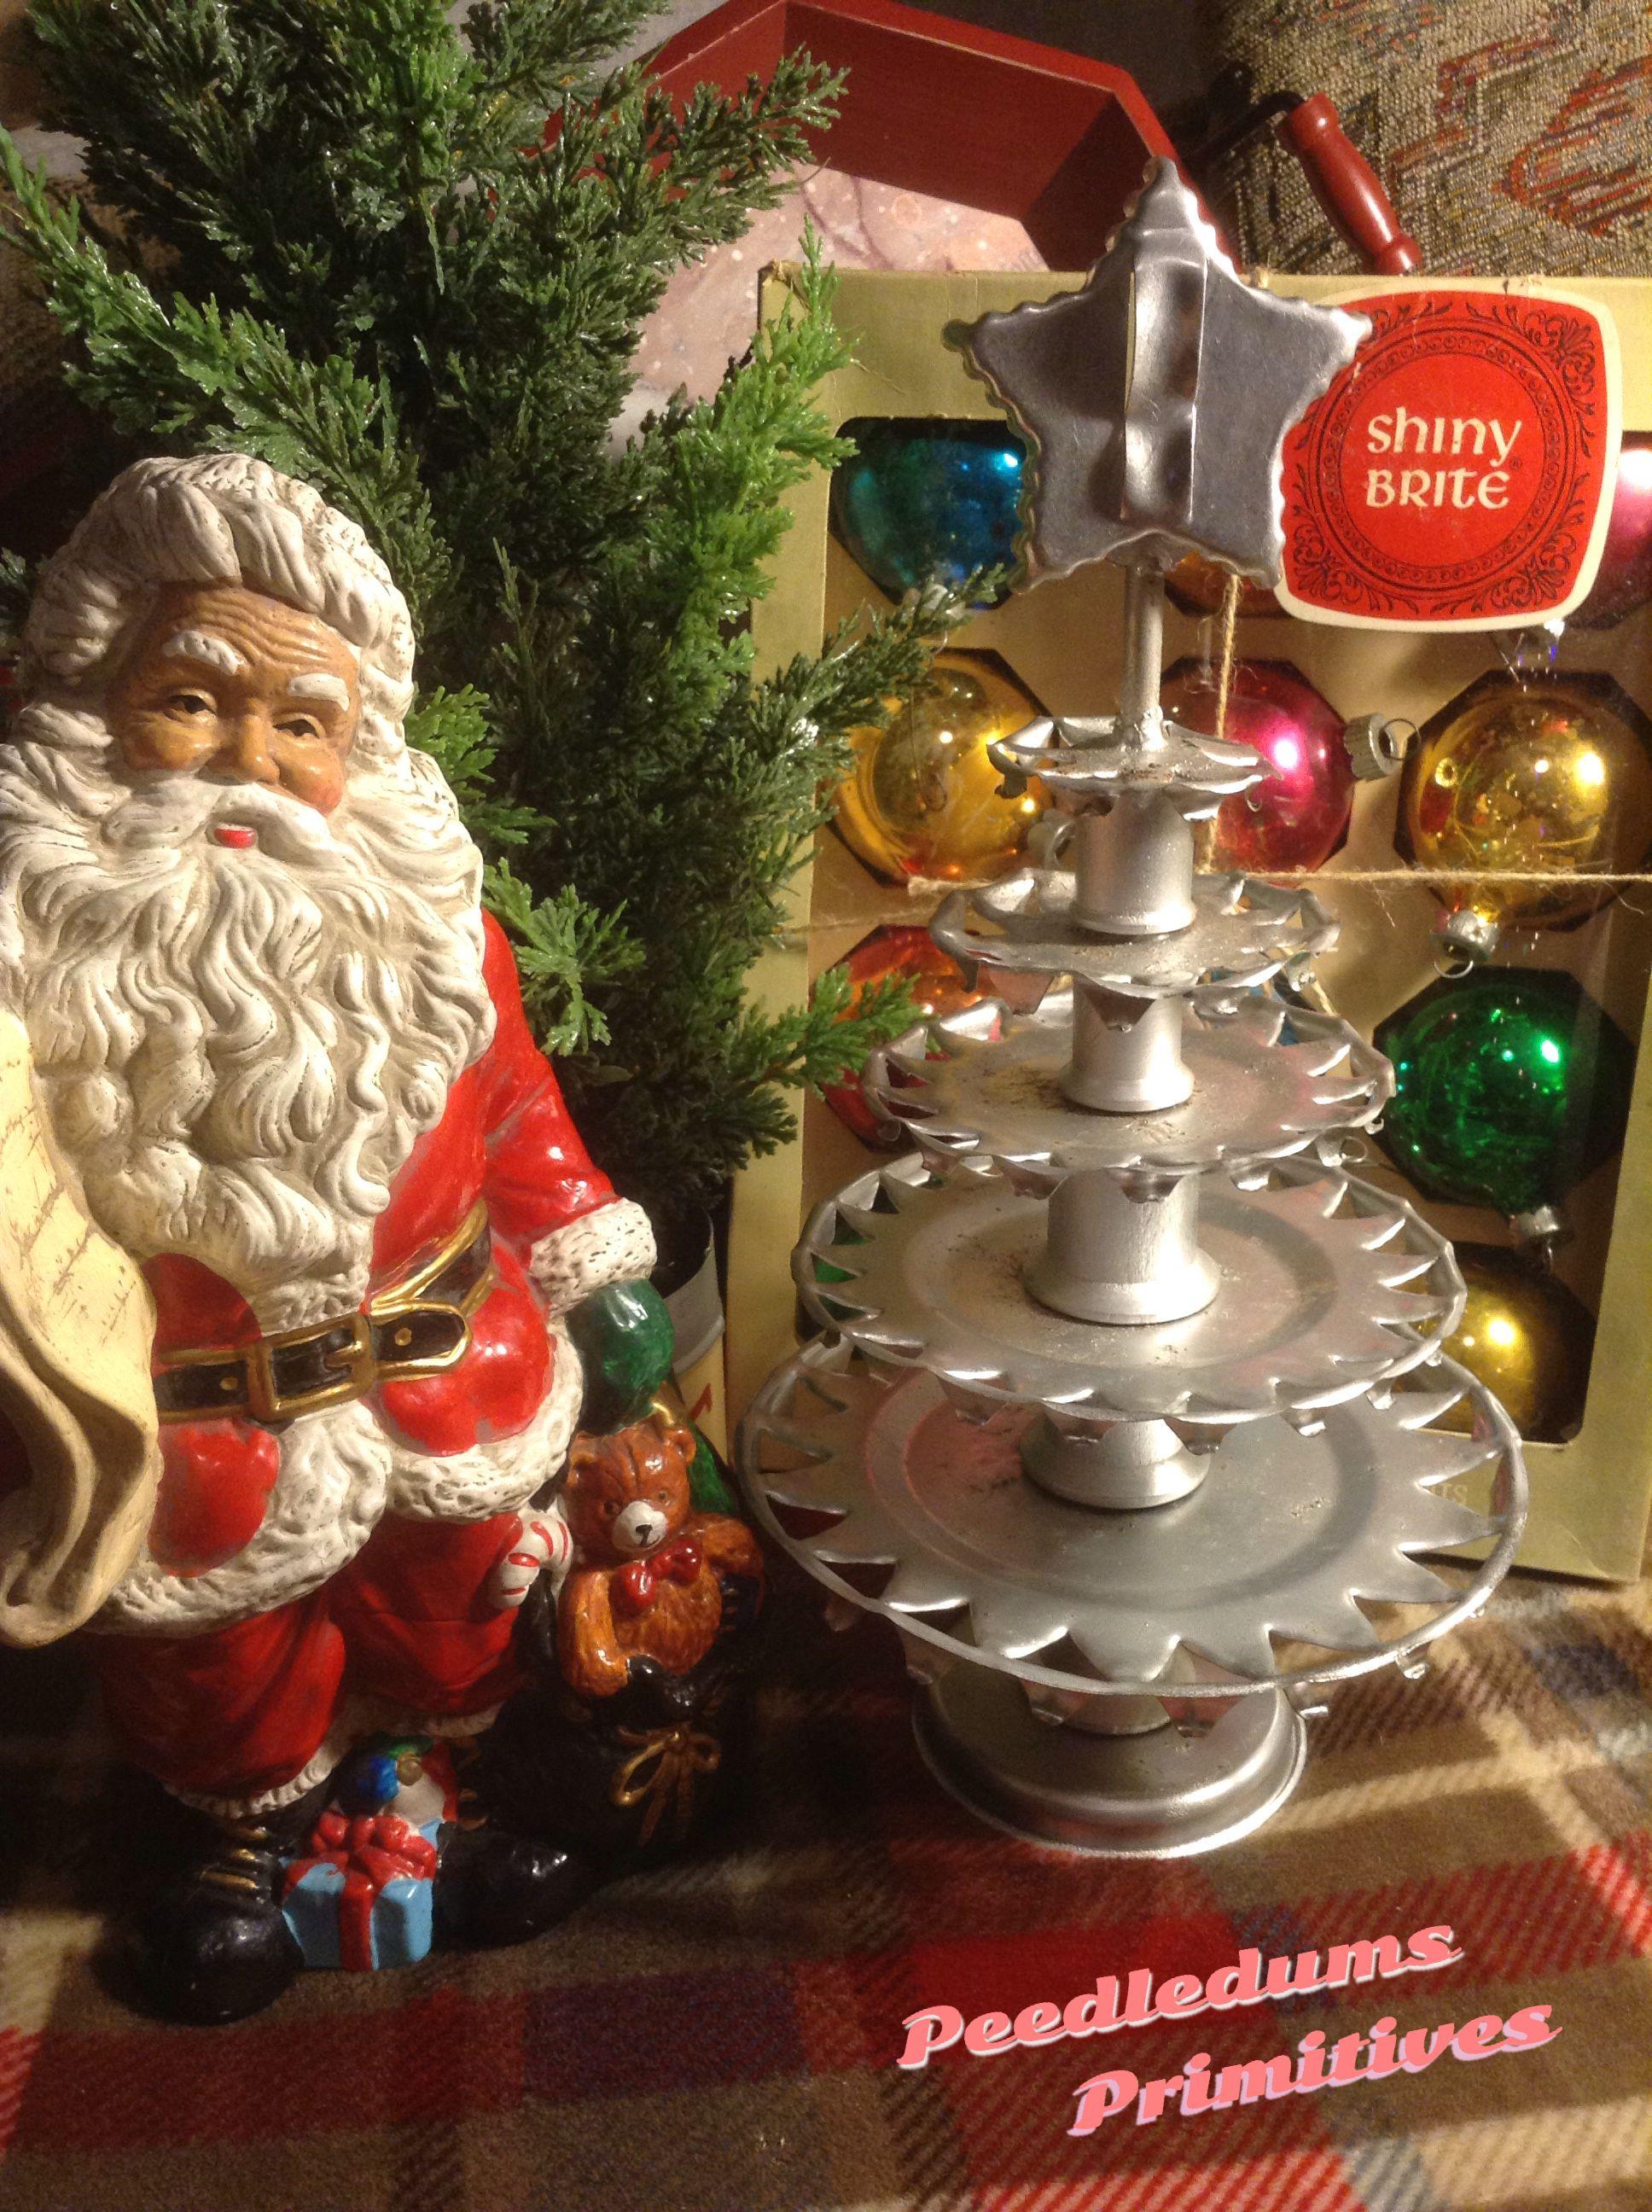 Tramp art tin Christmas tree Peedledums Primitives